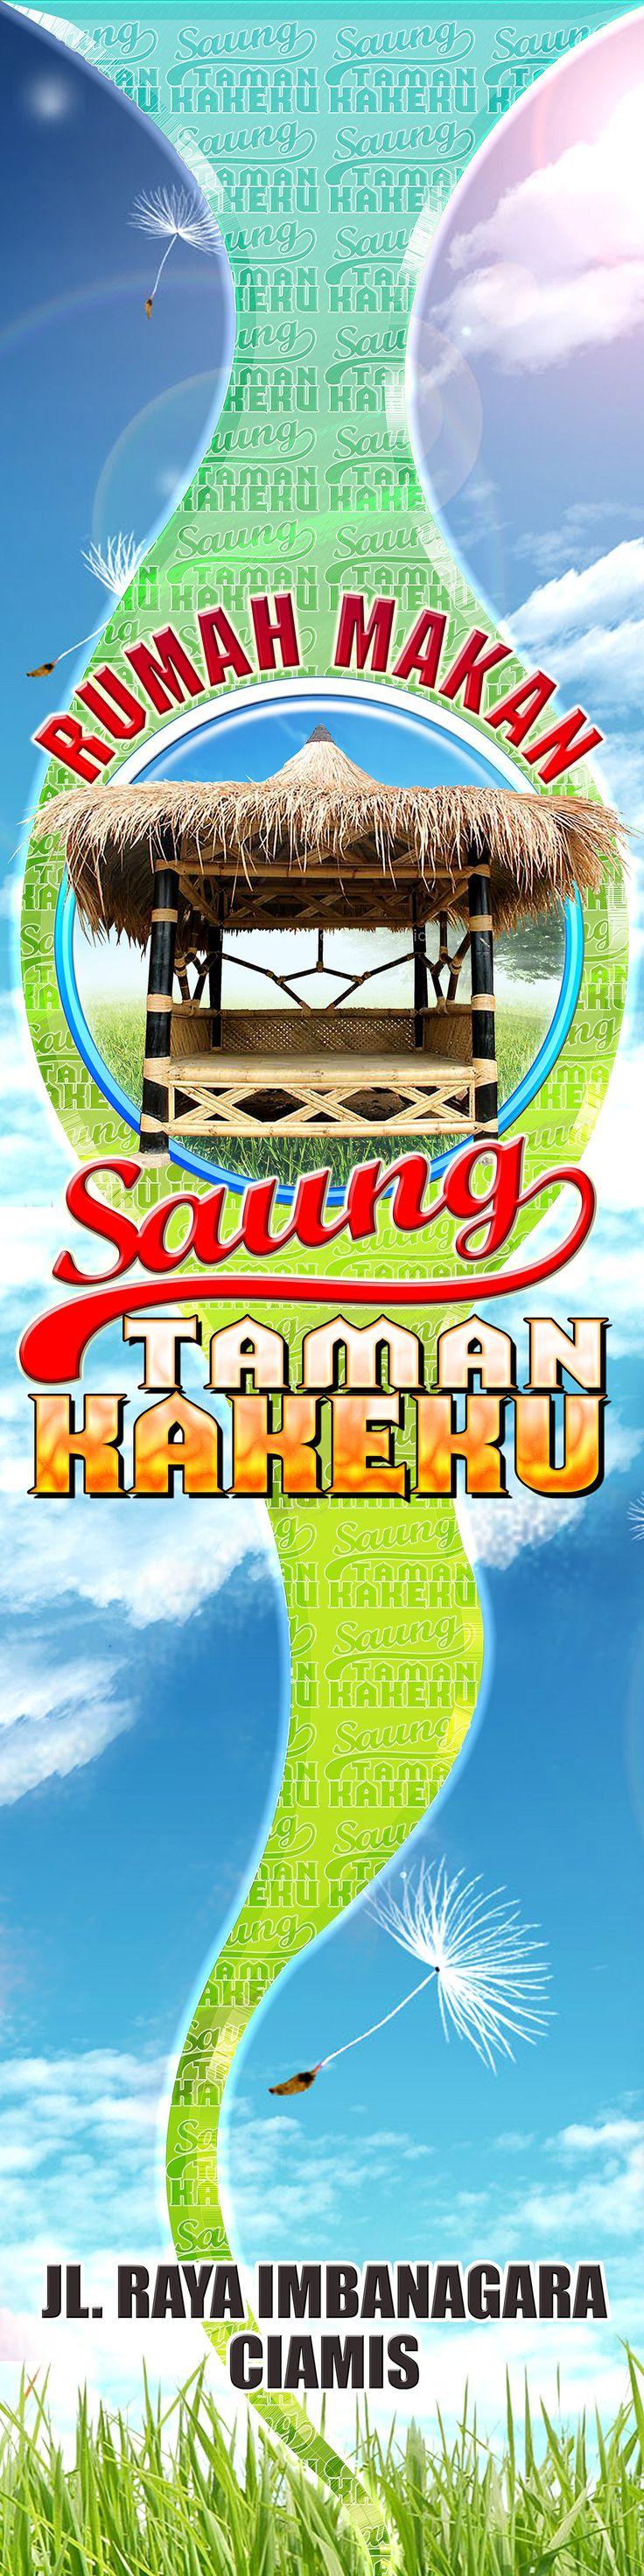 Saung Taman Kakeku 3 - Banner by Joen@f